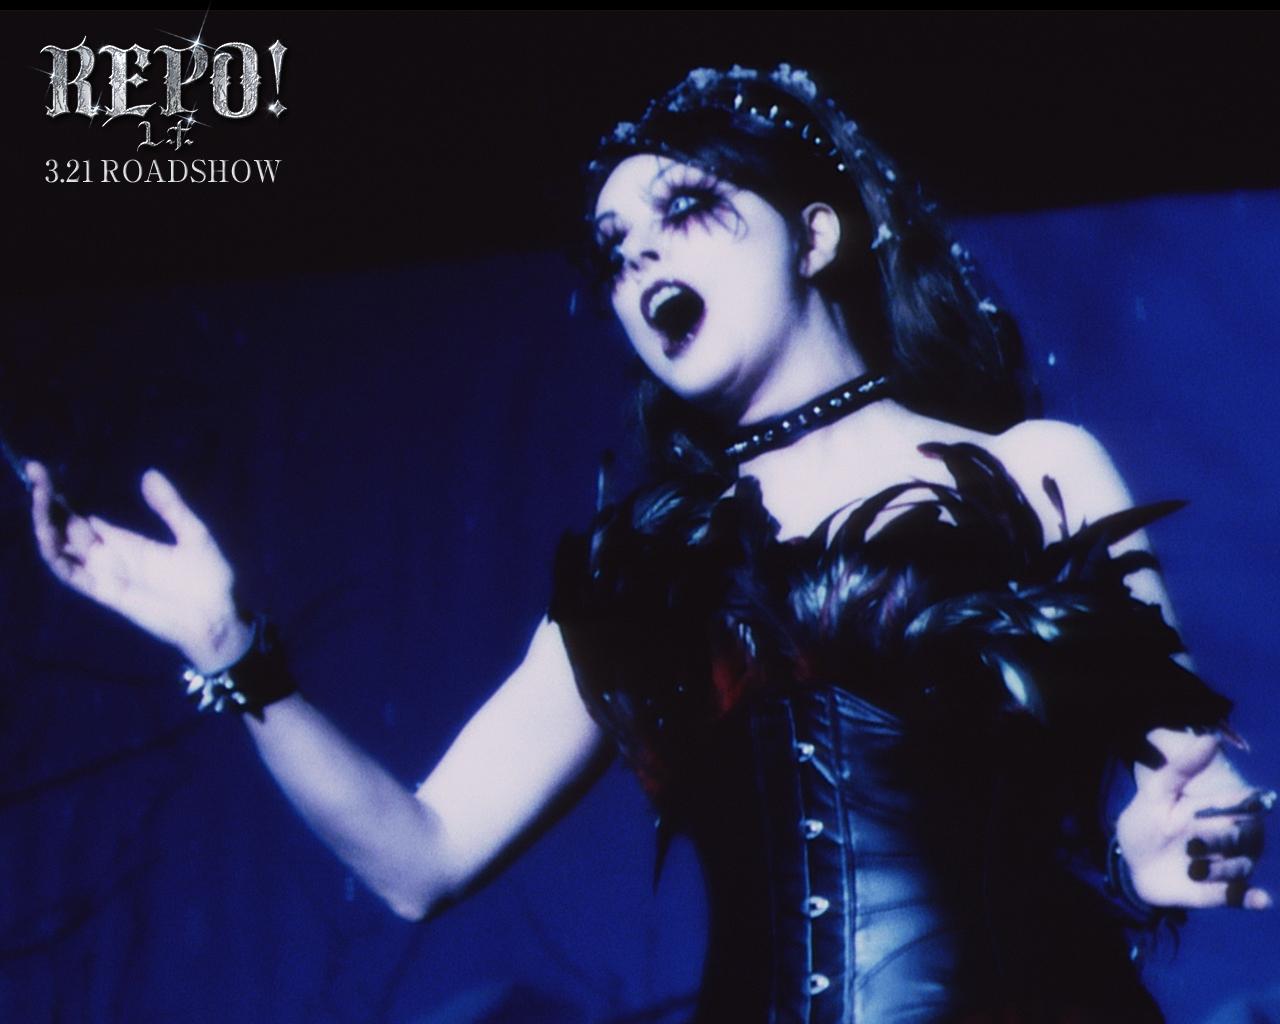 Image Repo! The Genetic Opera Movies film